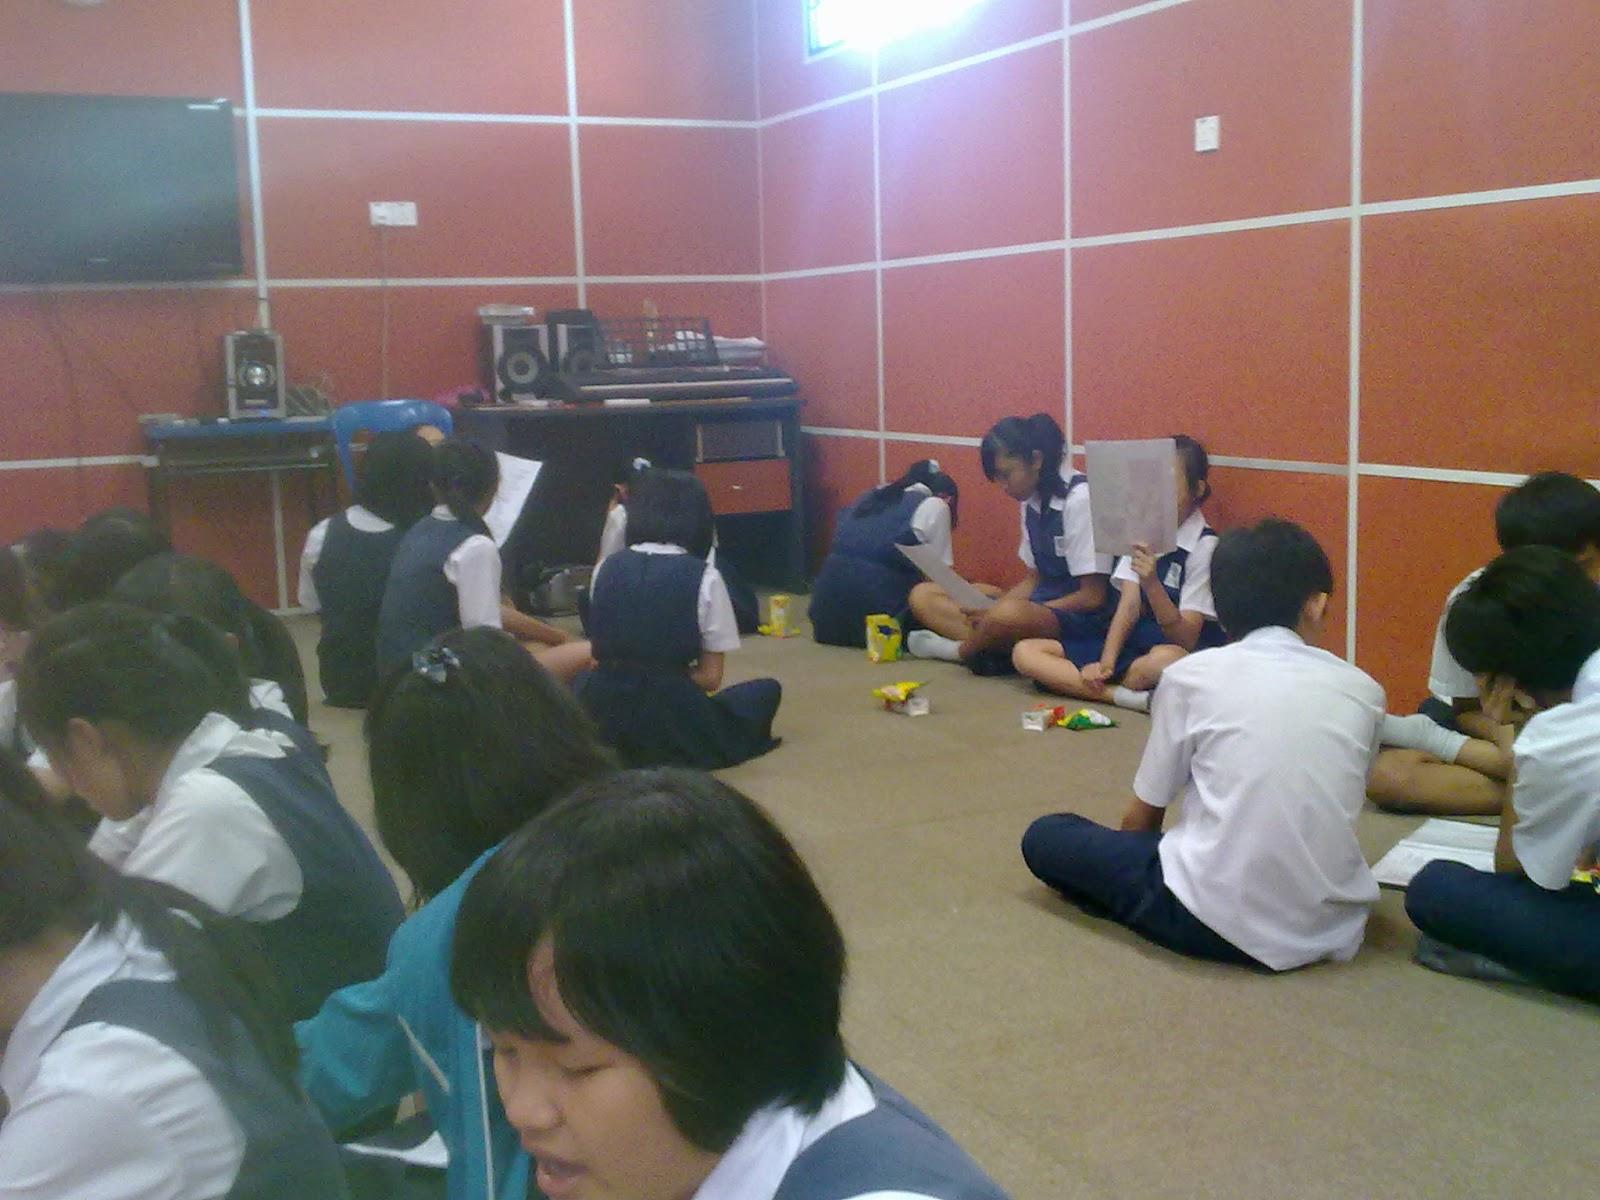 Murid-murid belajar menyanyi lagu Rasa Sayang.